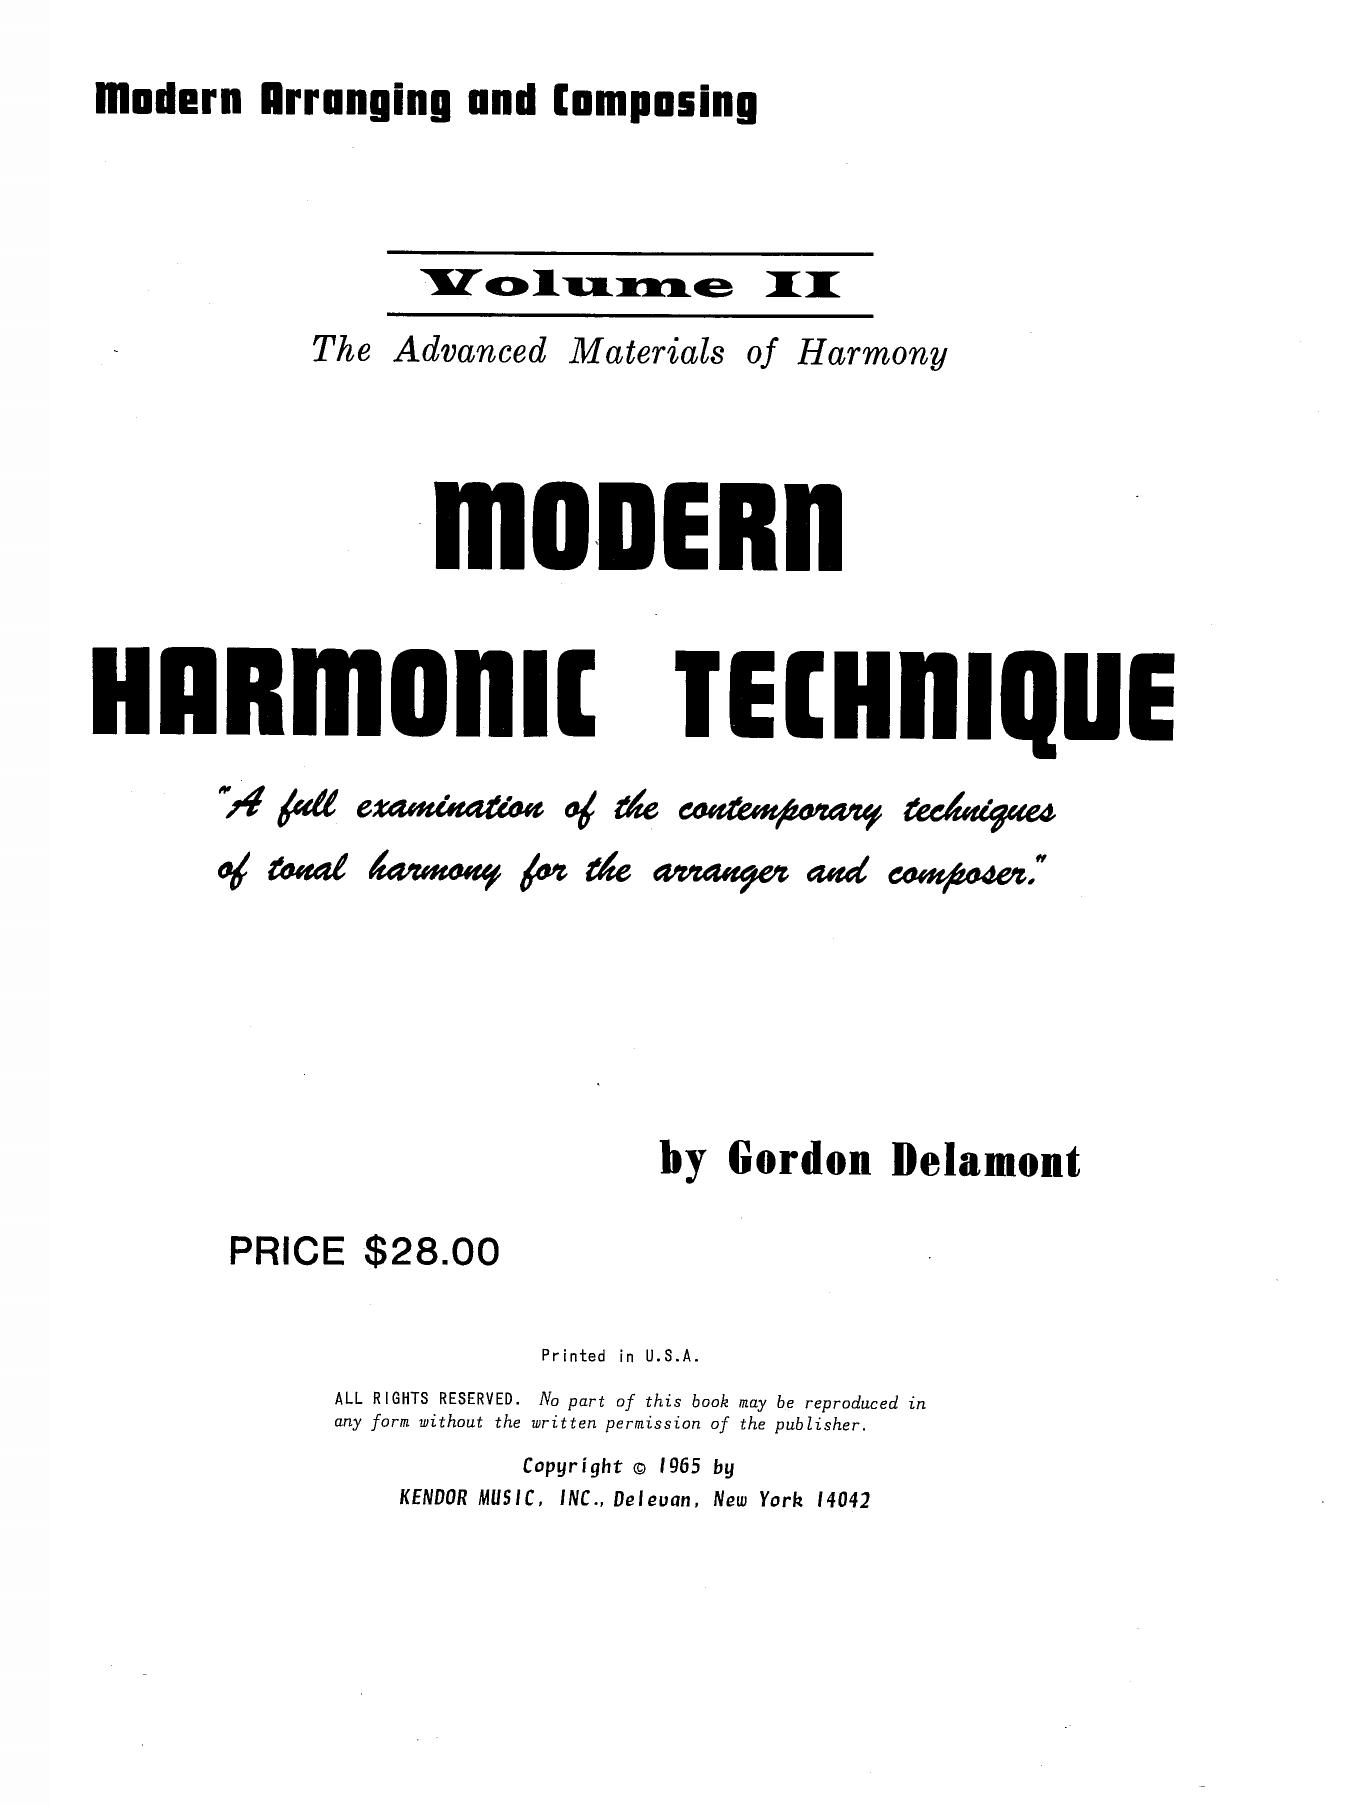 Modern Harmonic Technique, Volume 2 (Instrumental Method)